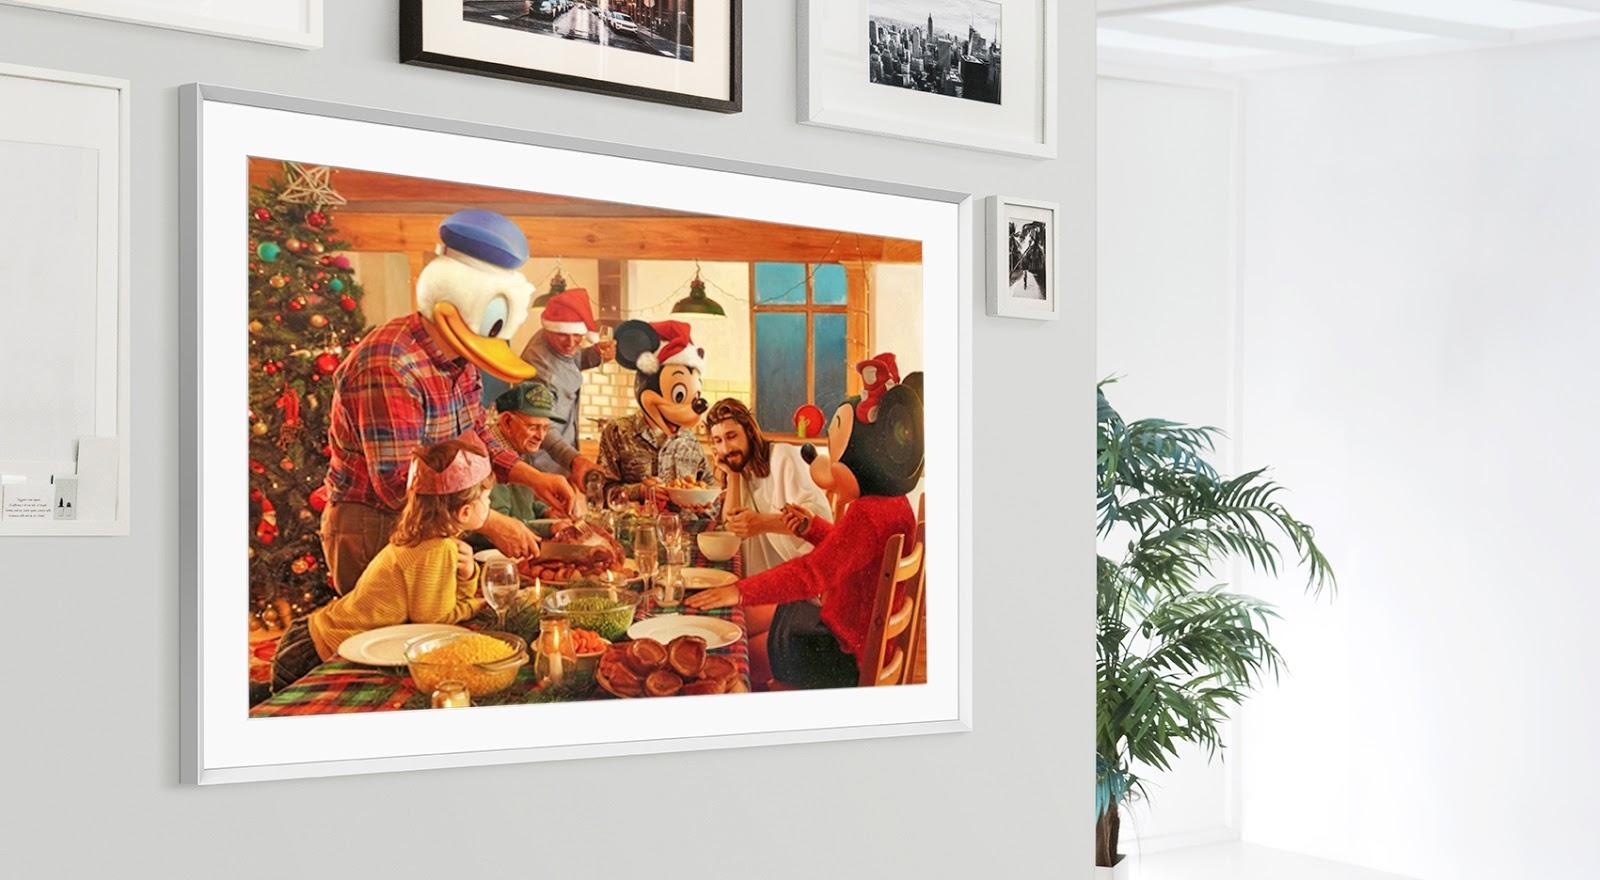 Samsung และ 333Art.Gallery ยกระดับผลงานศิลปะไทยสู่สายตาชาวโลกผ่าน Art Store บน The Frame 2021 ไลฟ์สไตล์ทีวีที่เติมเต็มสุนทรียะให้การใช้ชีวิตภายในบ้าน